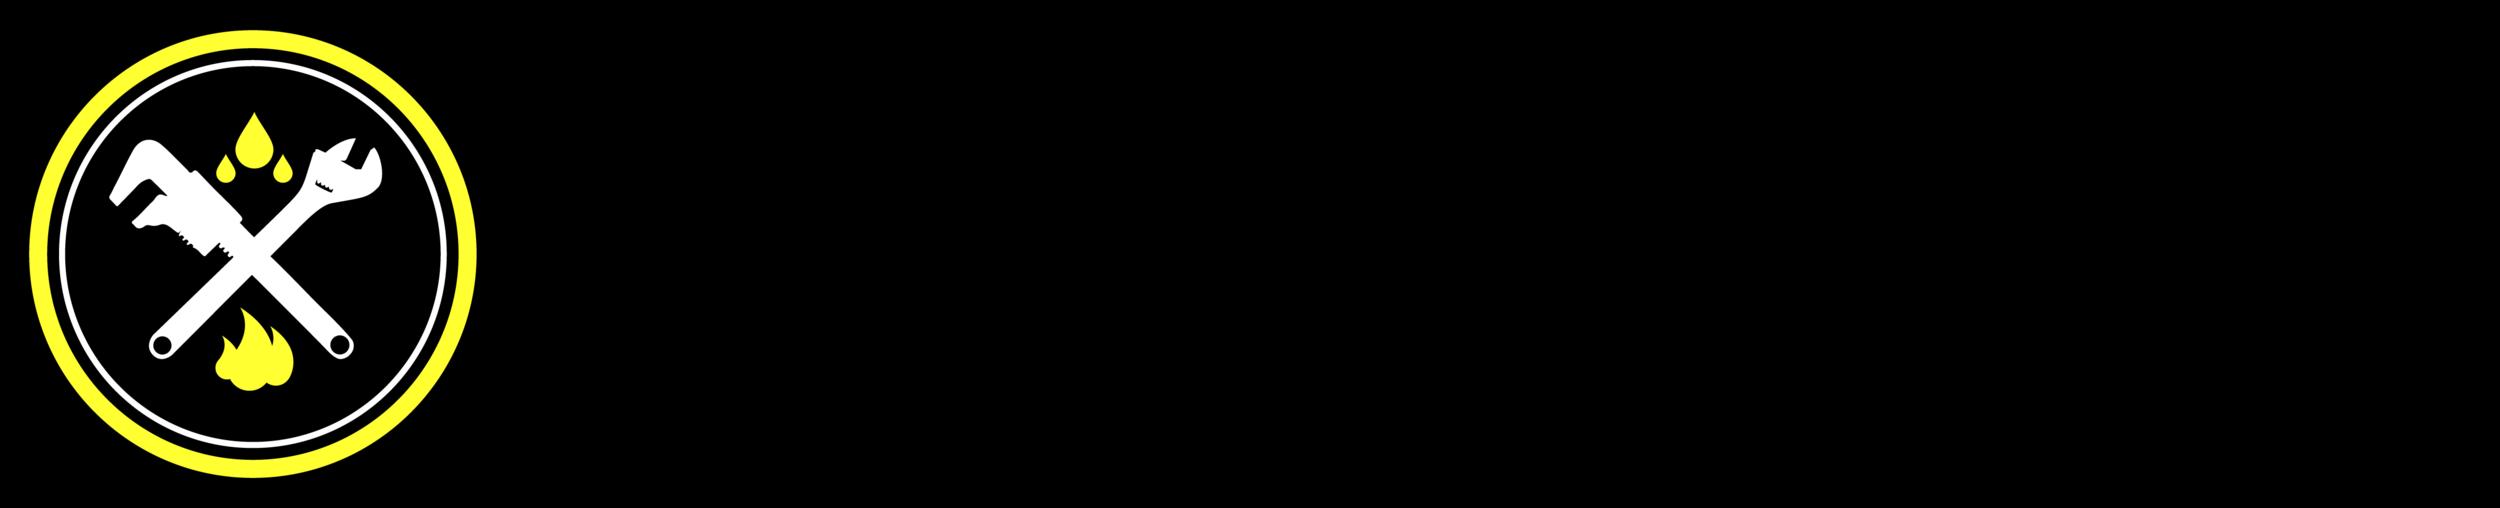 LVI-Taitajat-logo-vaaka-RGB.png